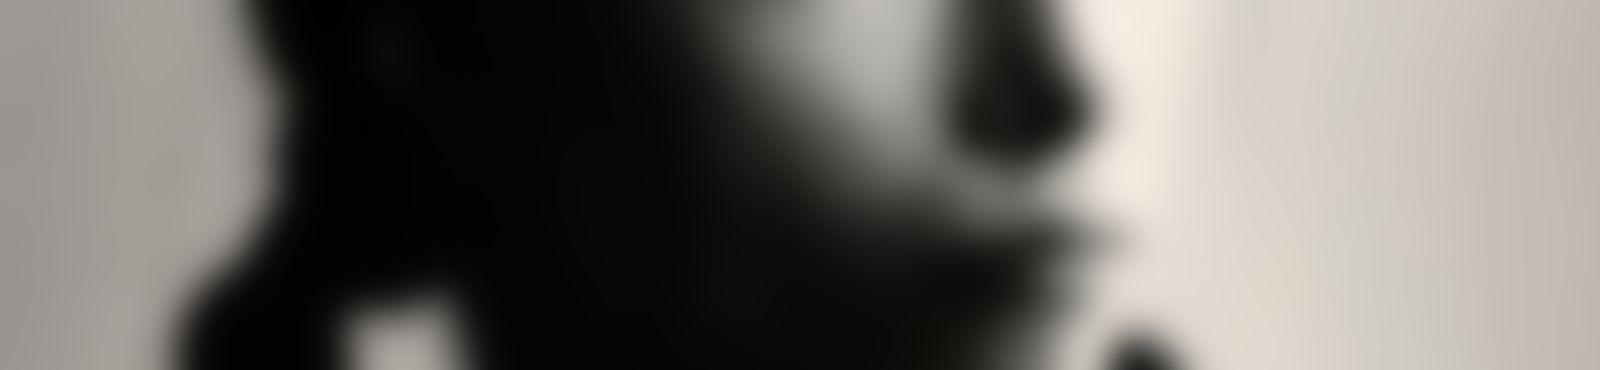 Blurred c621c582 9eec 4ec7 855d 25f9dcd0b325